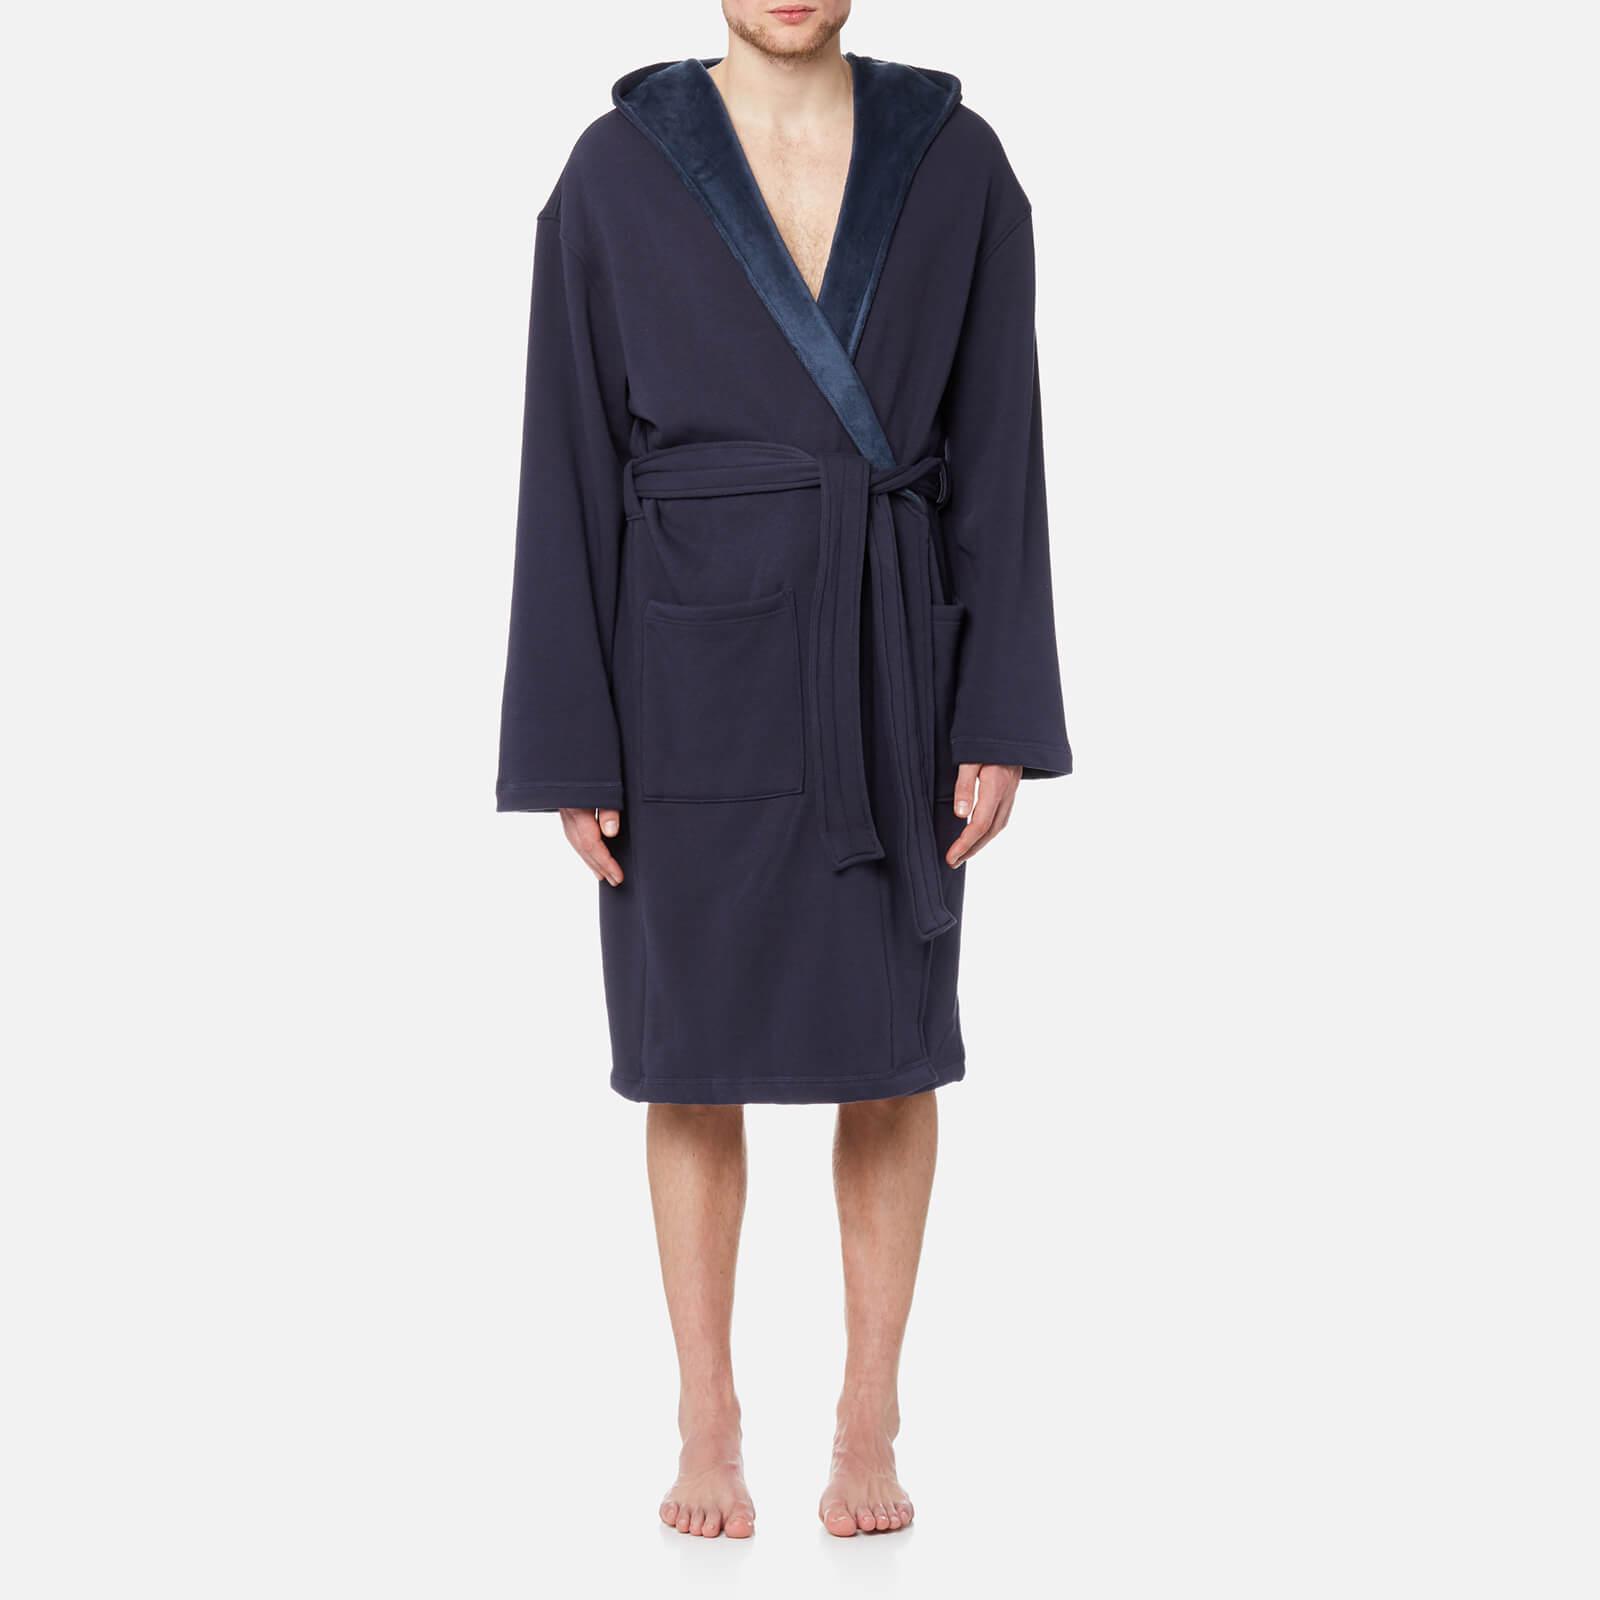 79254d80157 UGG Australia Men's Brunswick Heritage Robe - Navy